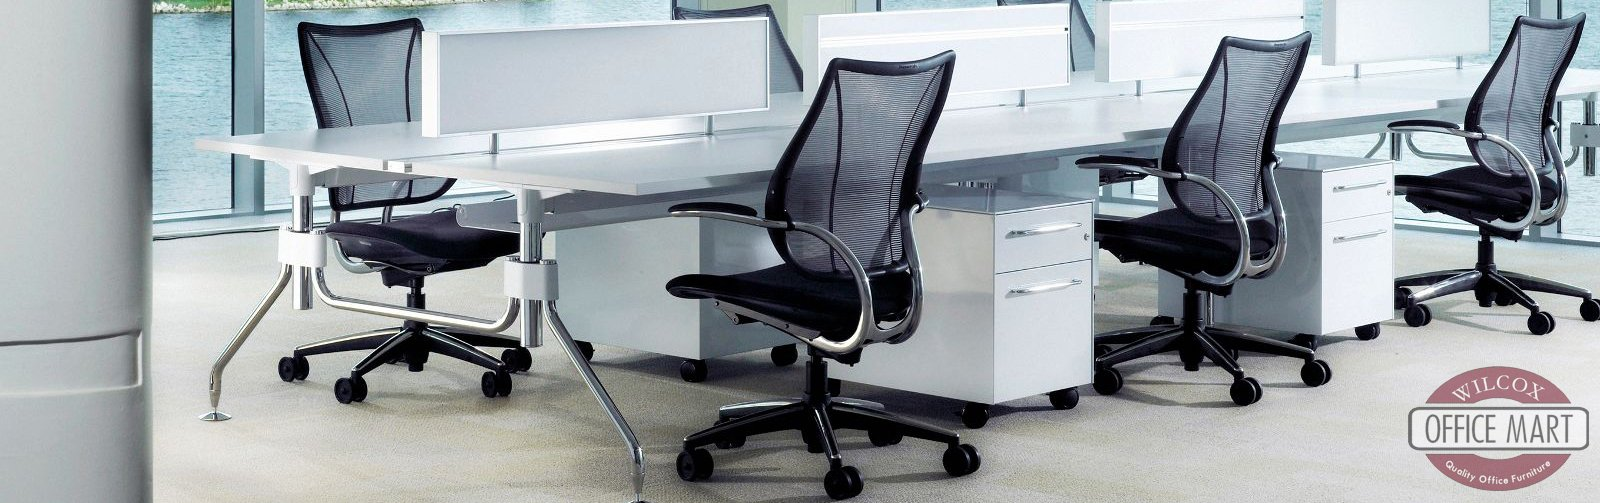 liberty-task-chair-5_2048x2048